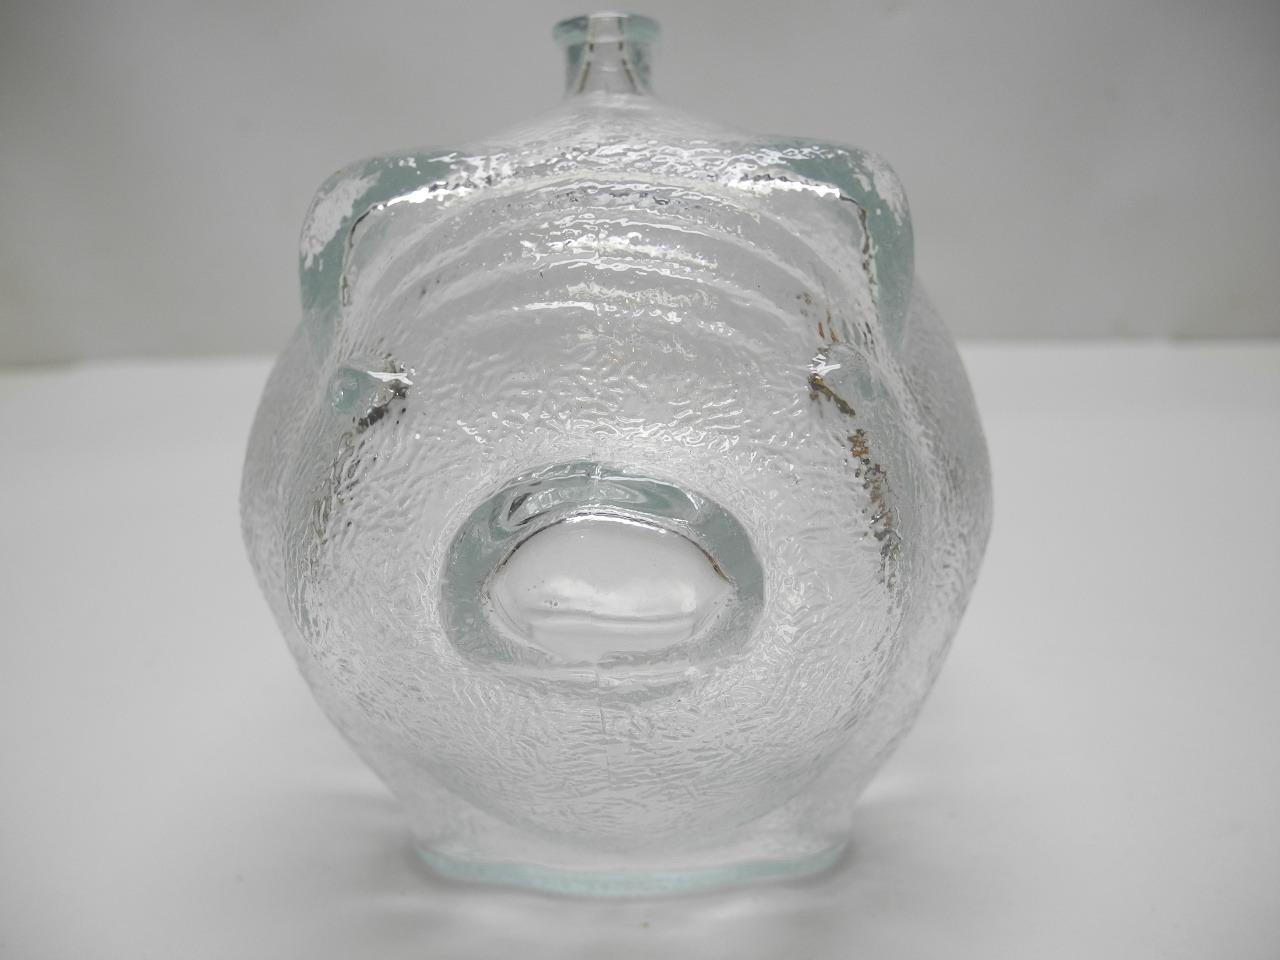 Vintage Anchor Hocking Large Clear Glass Pig Piggy Bank